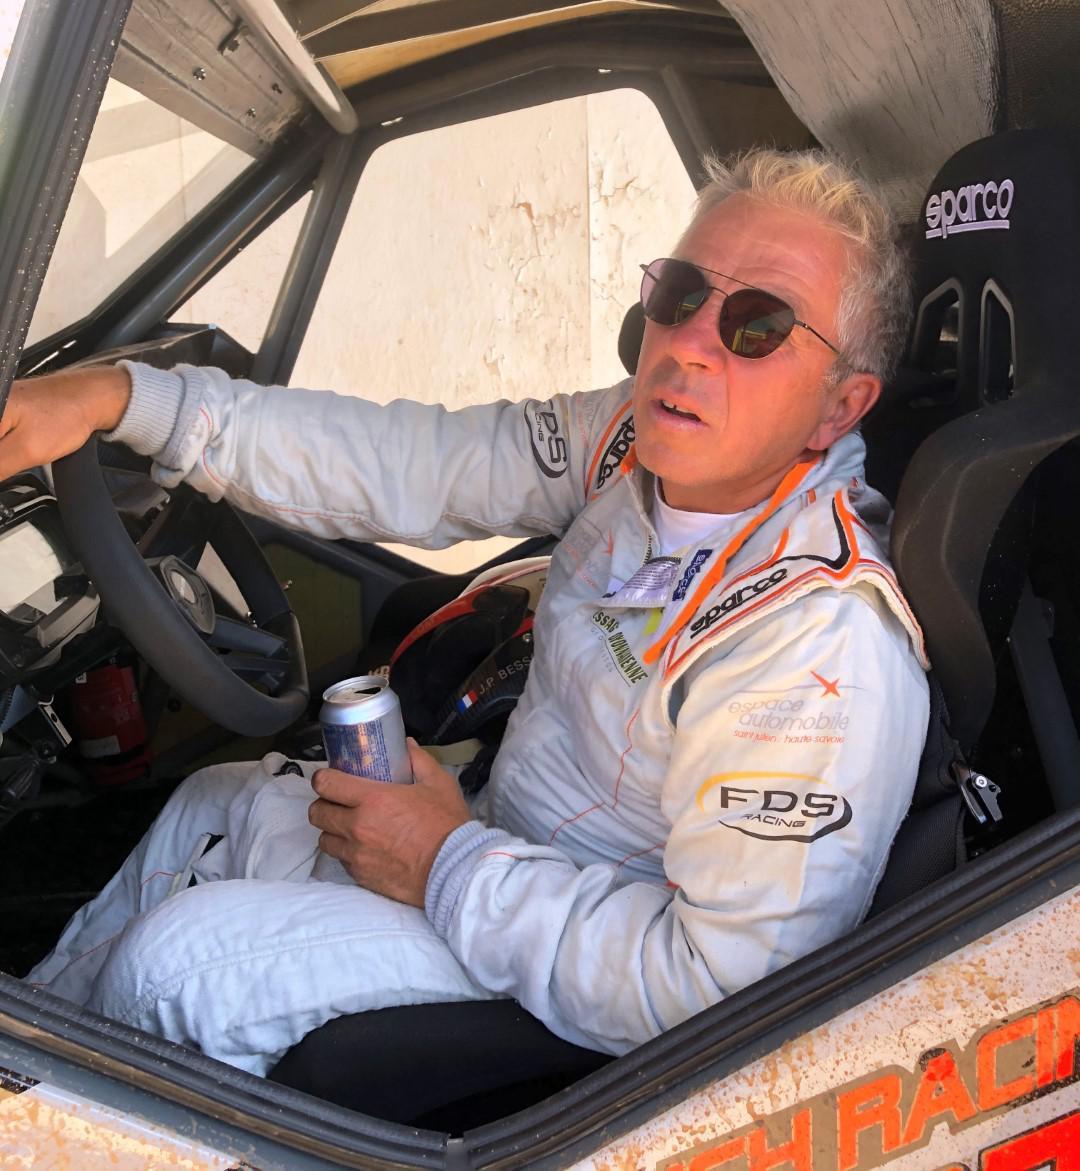 dakar-le-team-pinch-racing-s-active-enfin-1399-1.jpg